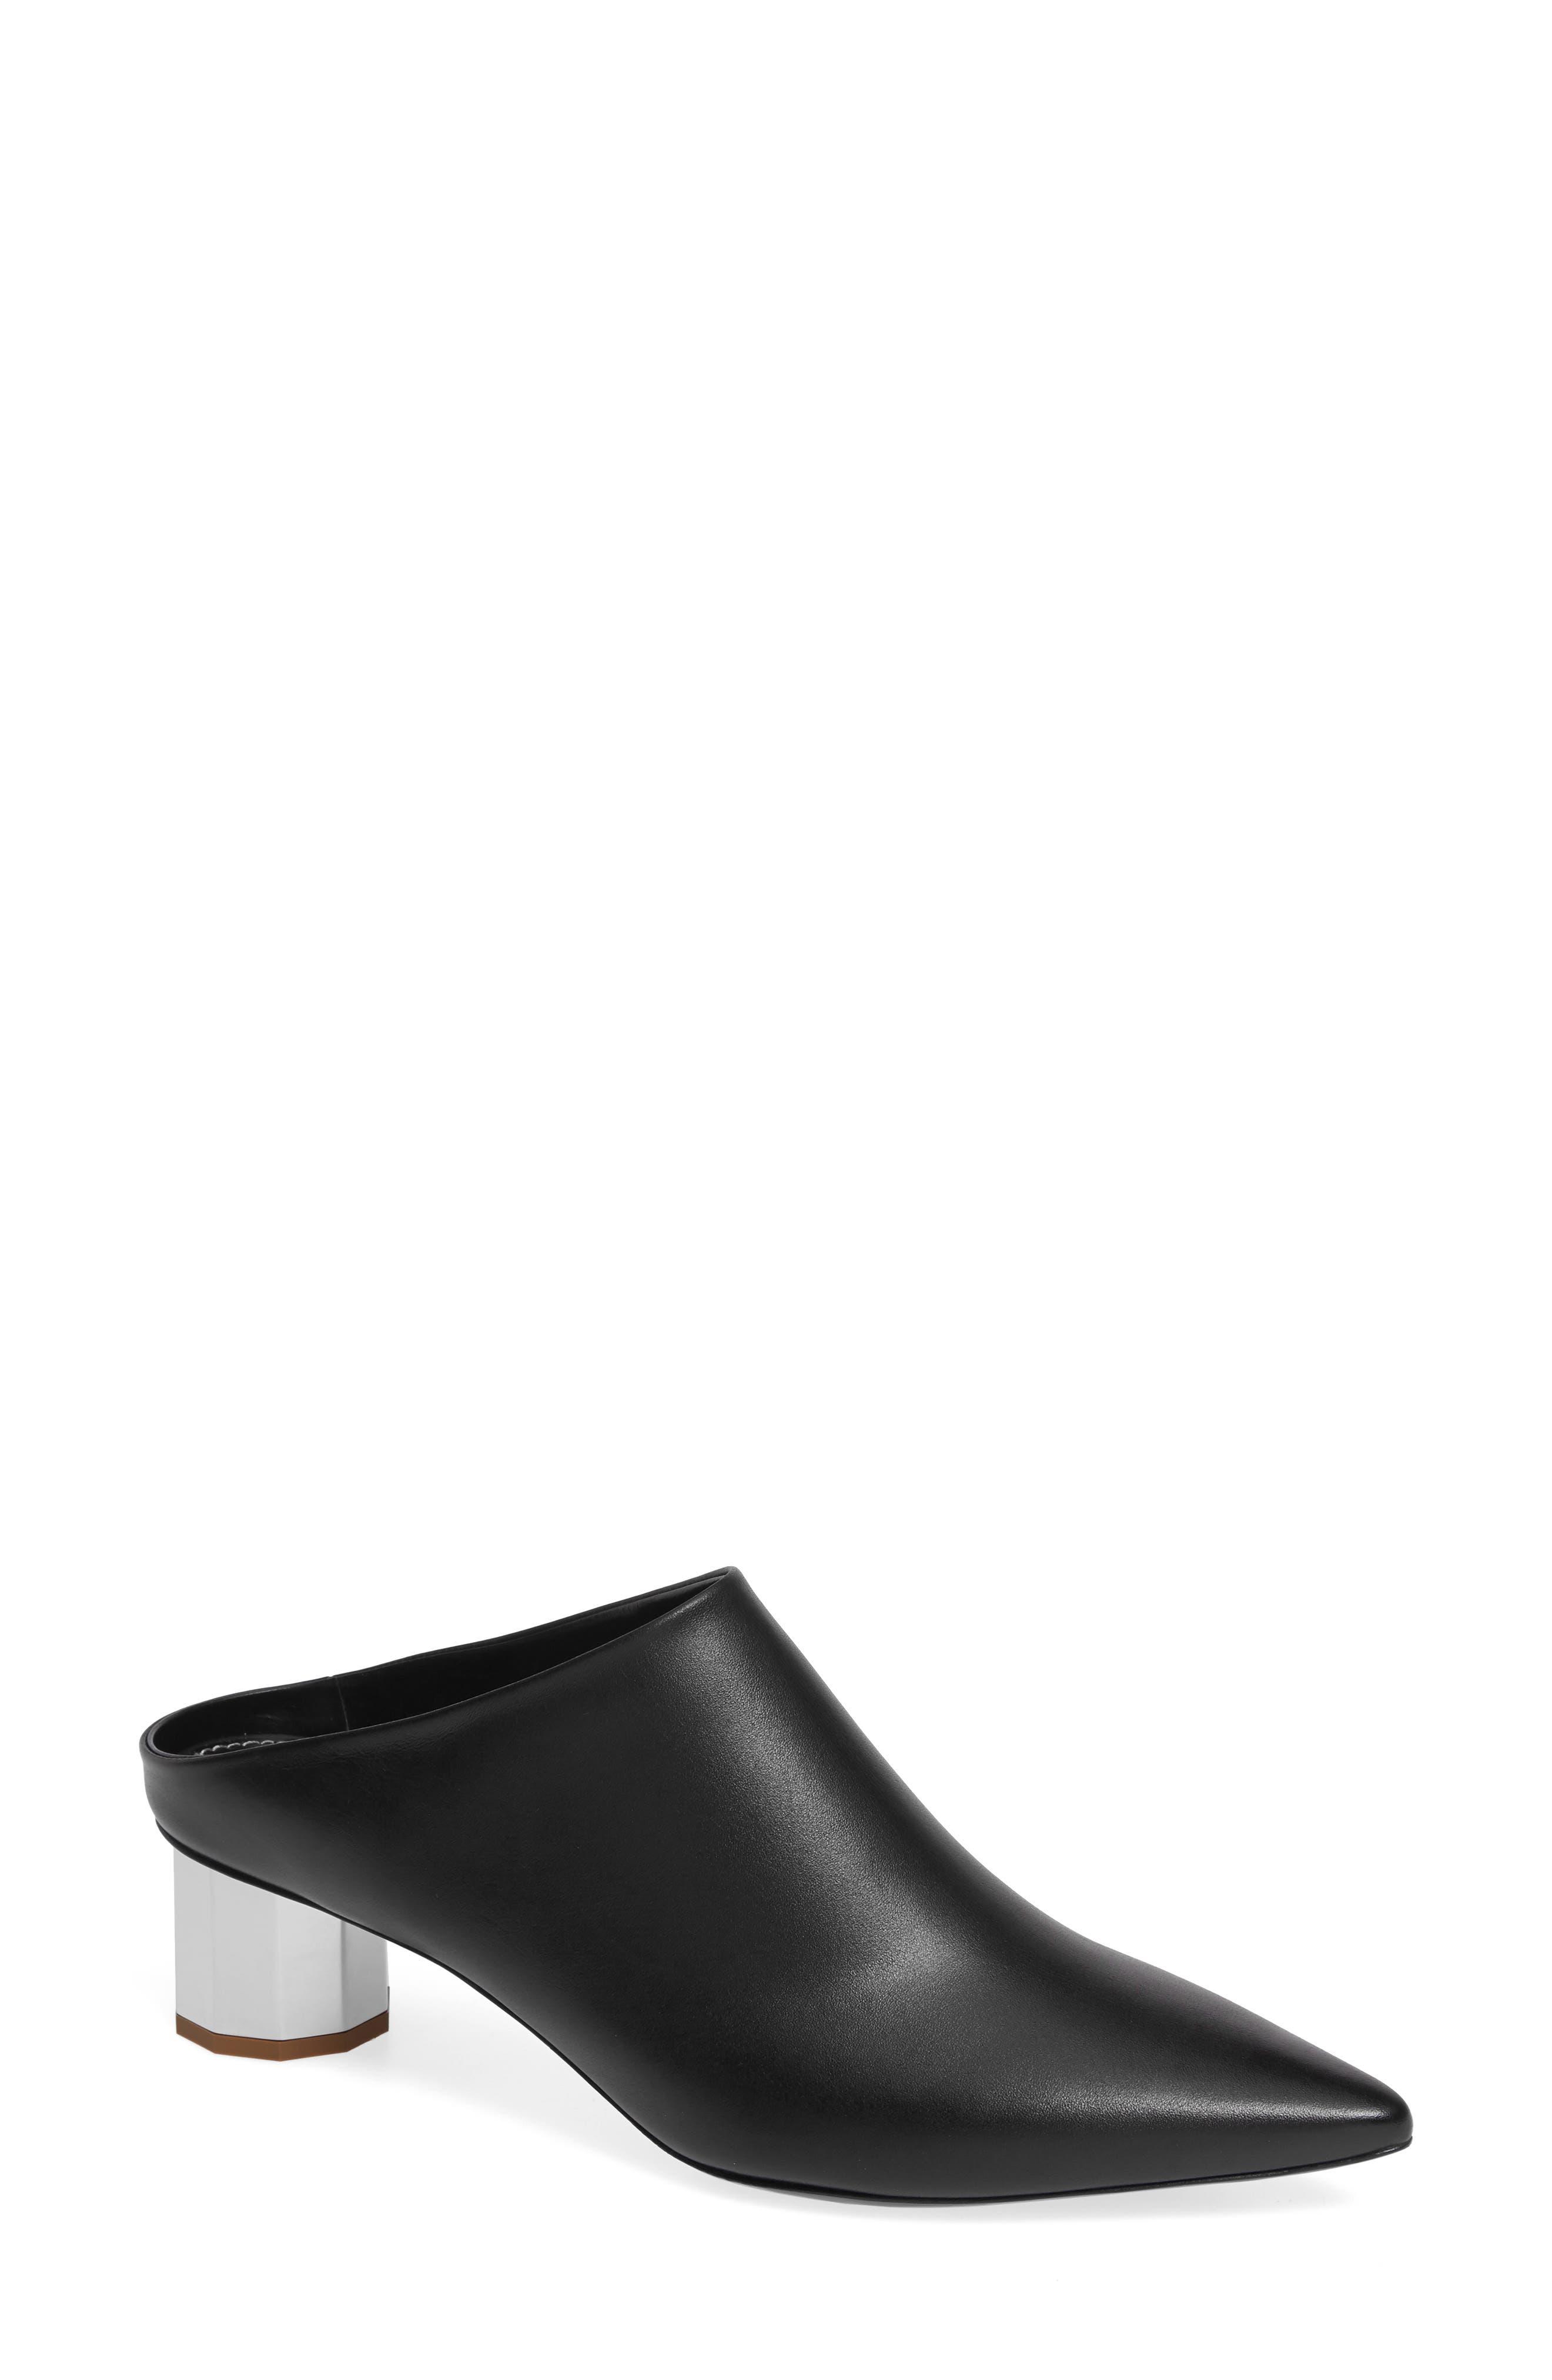 PROENZA SCHOULER Pointy Toe Mule, Main, color, BLACK